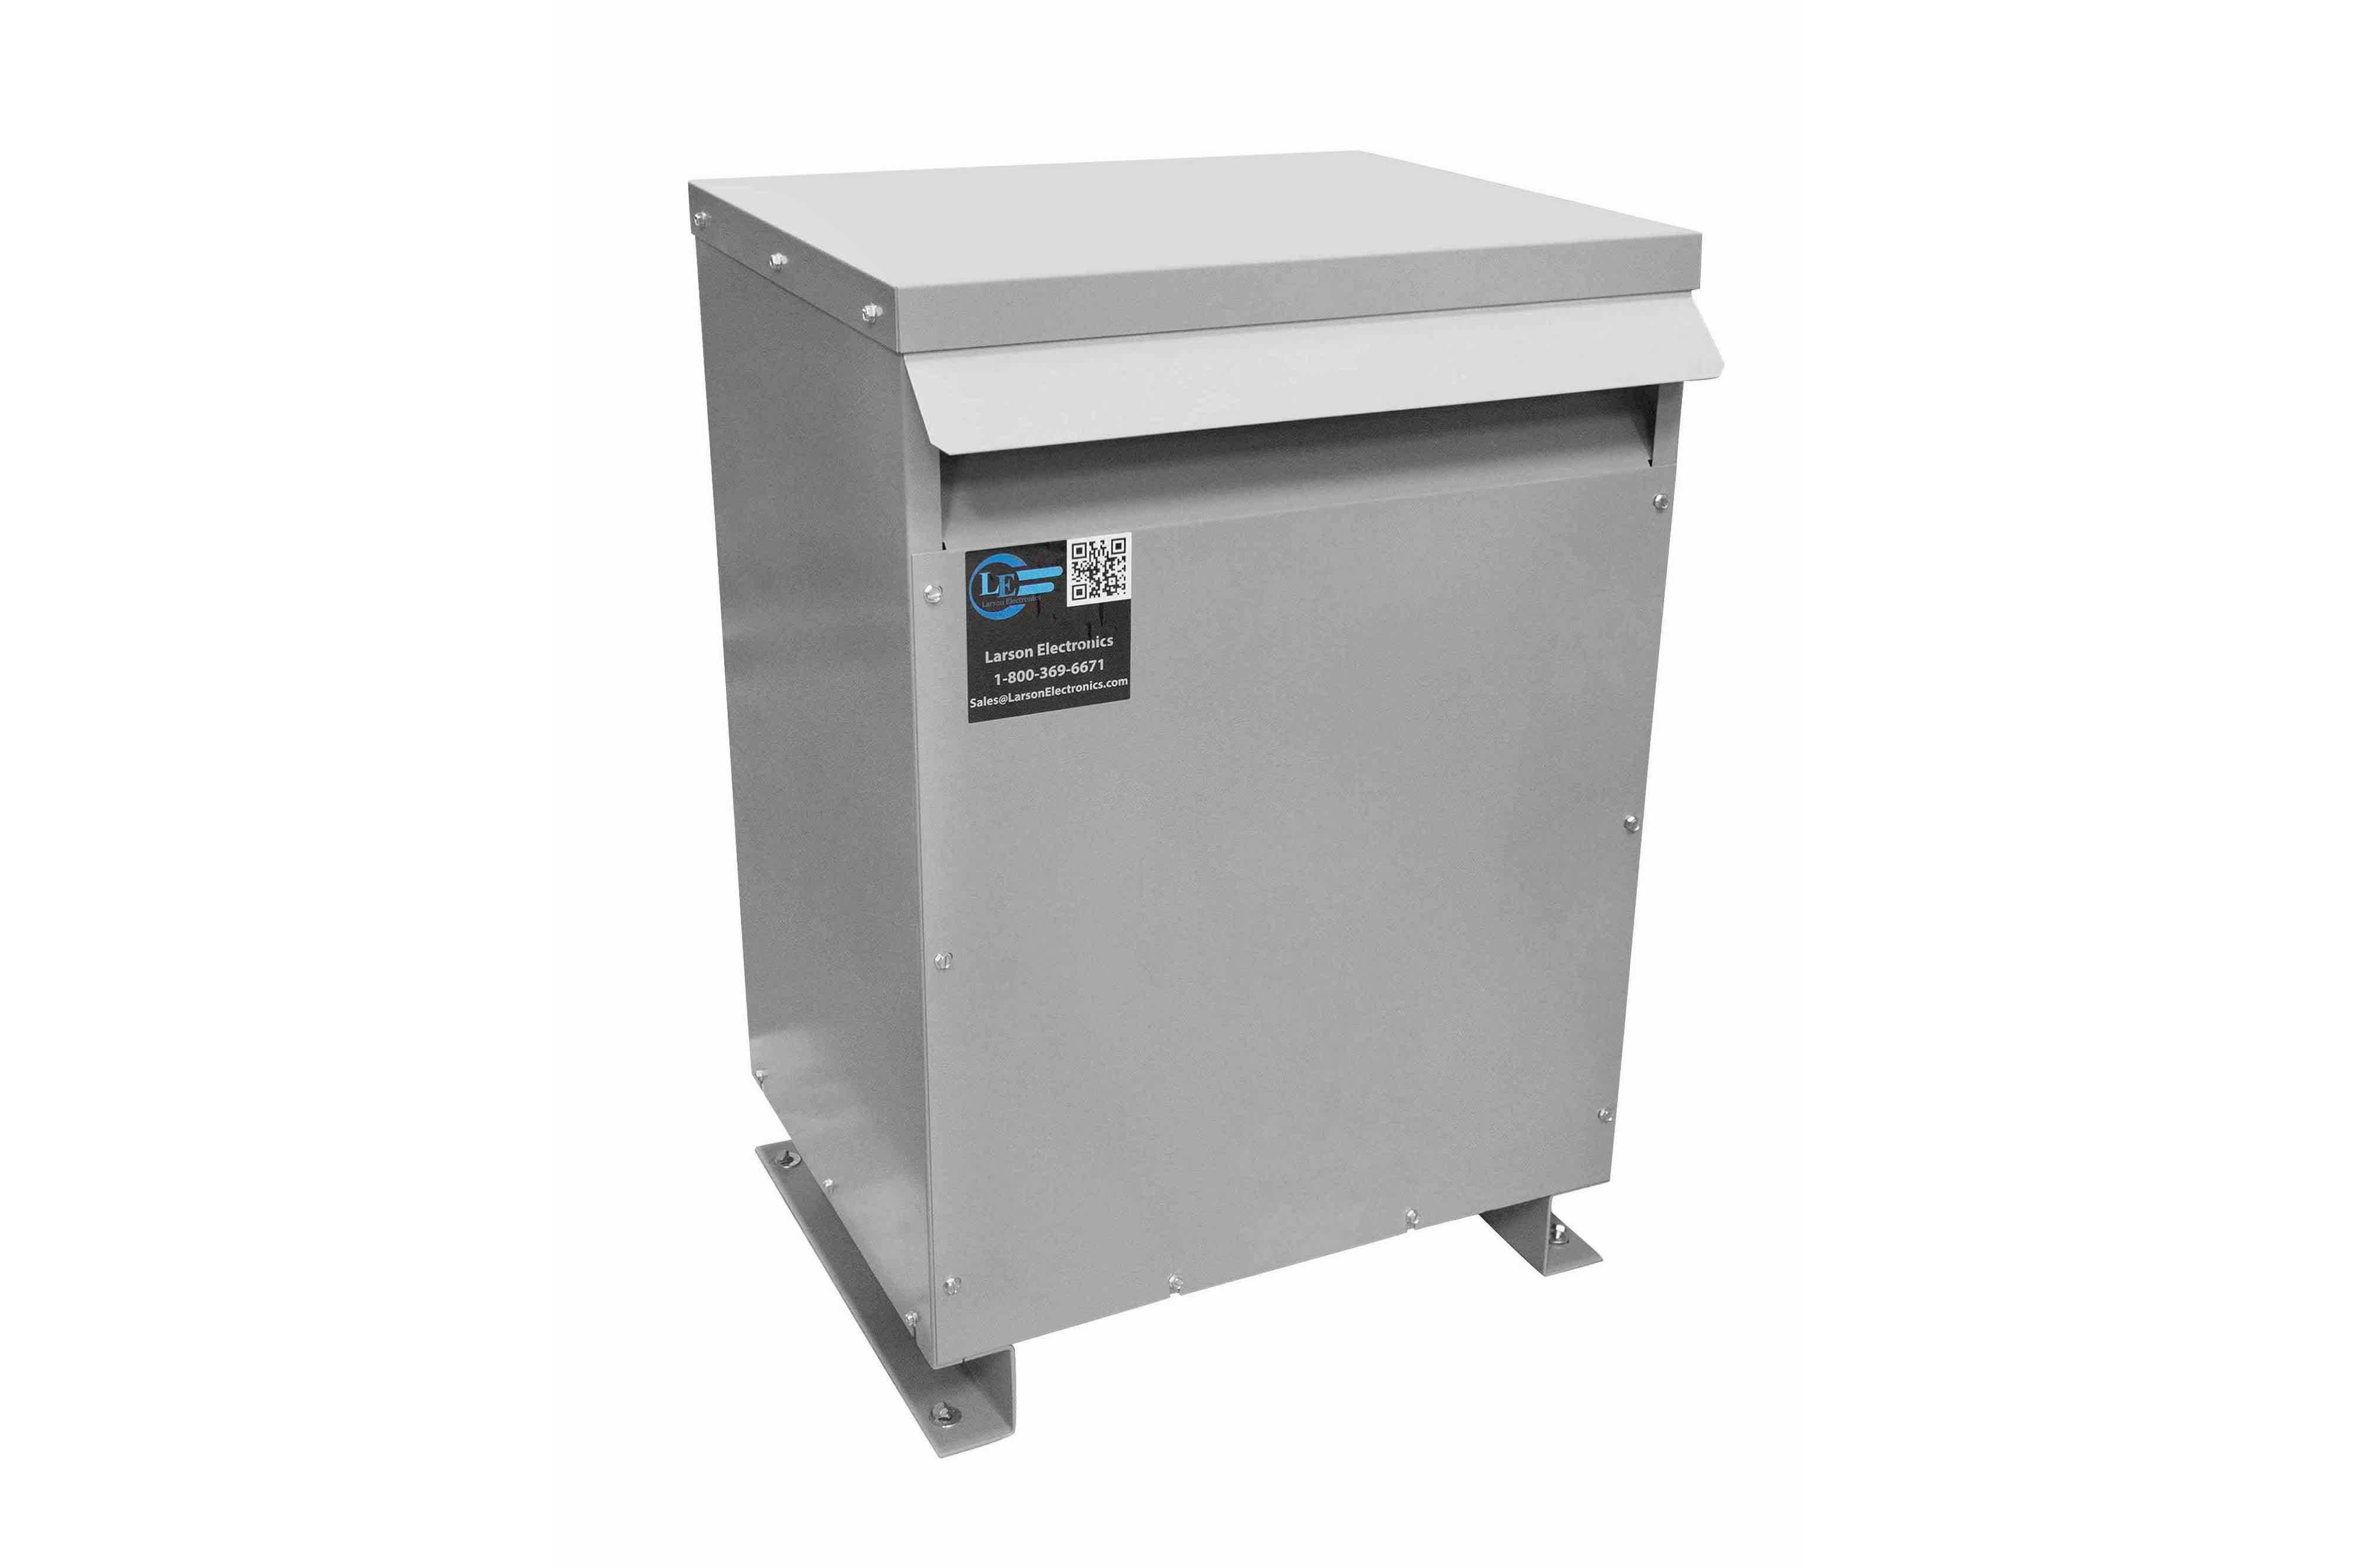 200 kVA 3PH Isolation Transformer, 460V Wye Primary, 415V Delta Secondary, N3R, Ventilated, 60 Hz